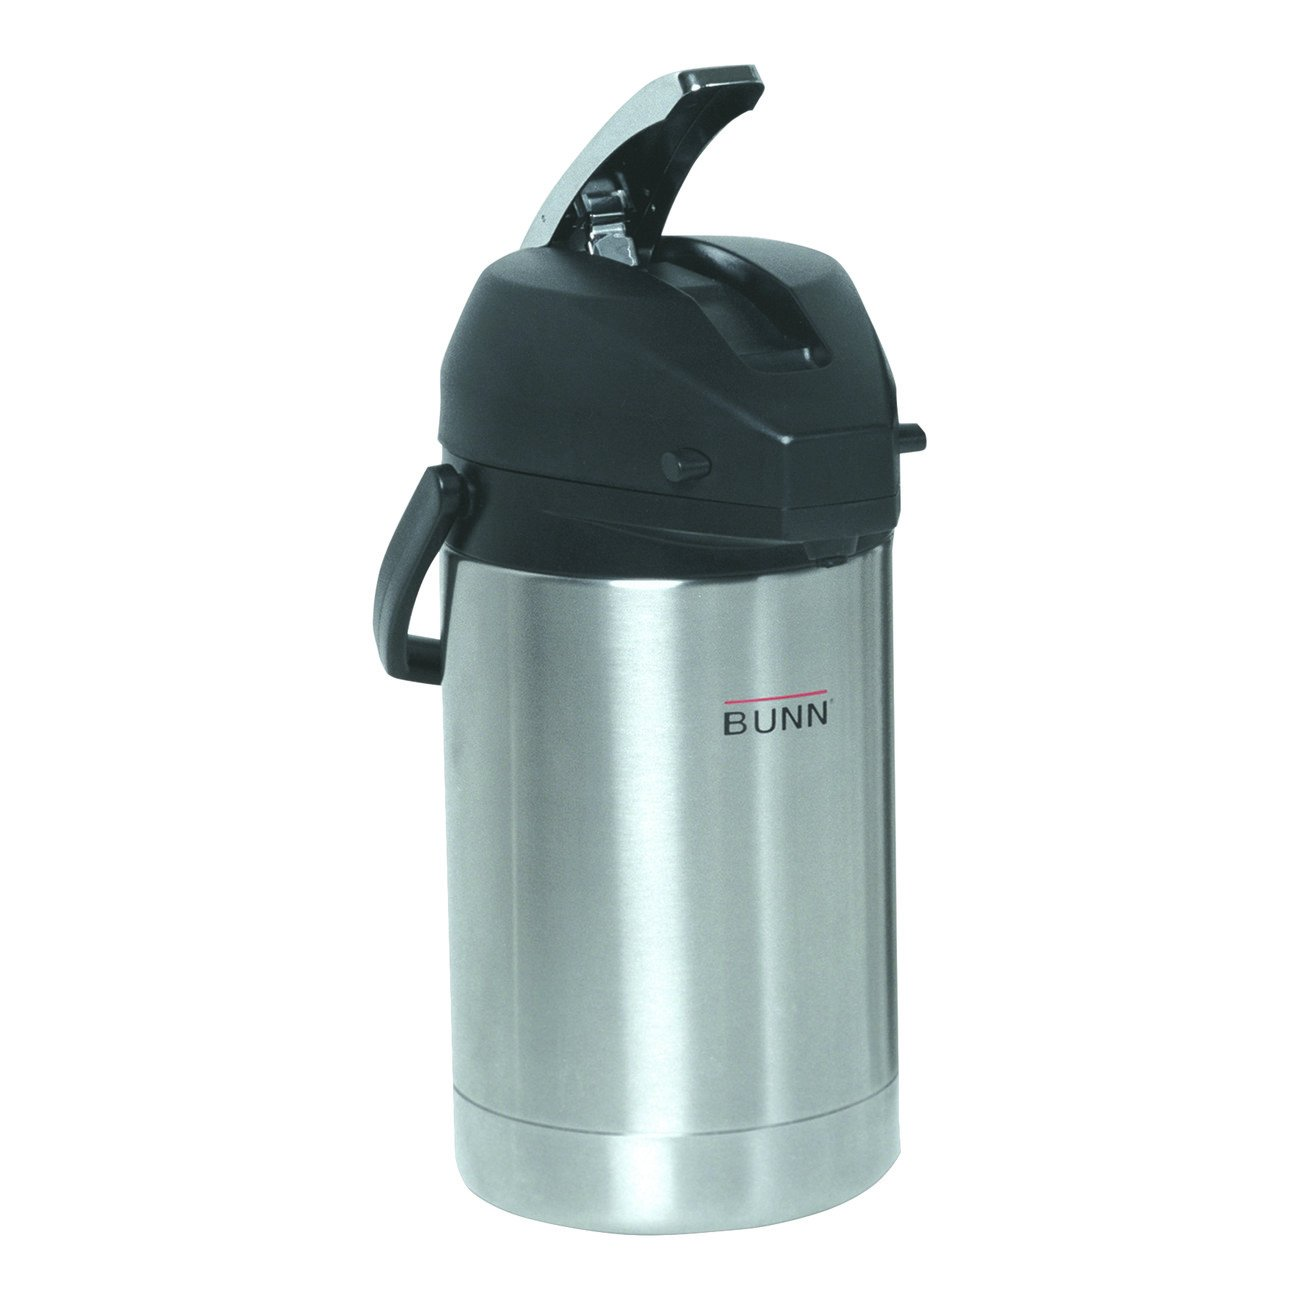 BUNN 32125.0000 2.5 Liter Lever-Action Airpot, Stainless Steel by BUNN